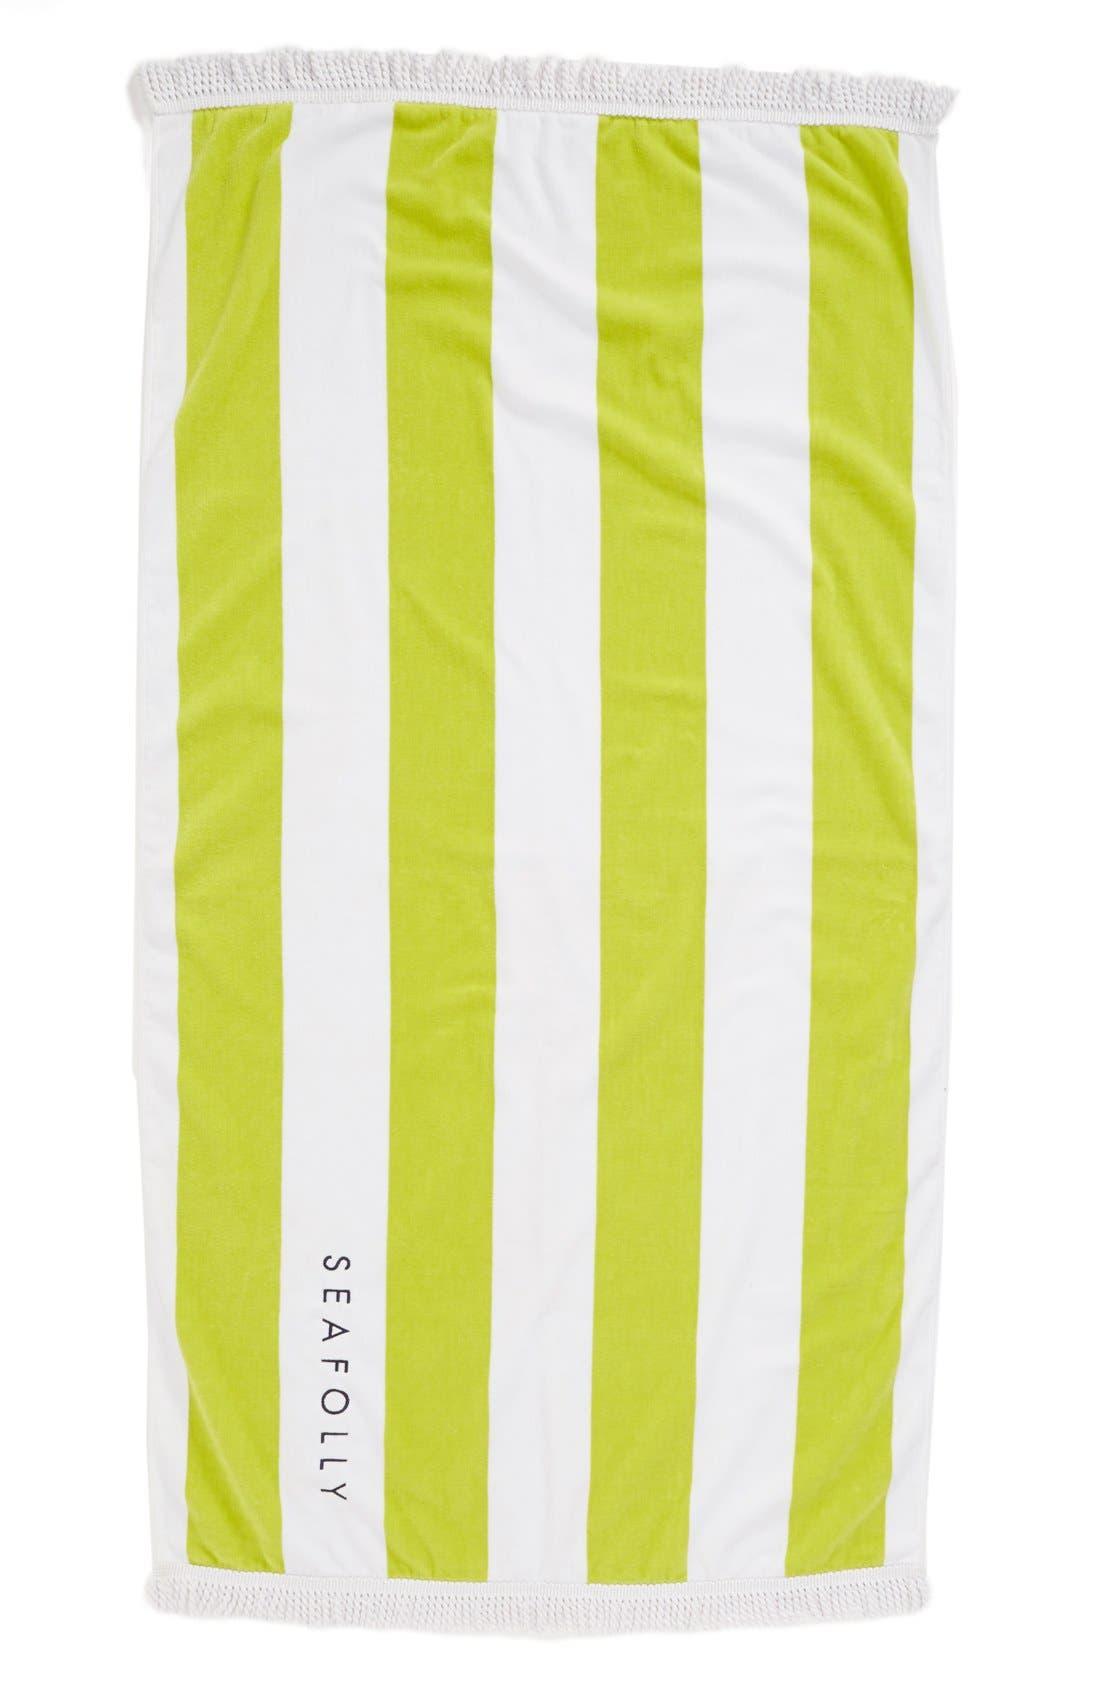 Main Image - Seafolly 'Splash' Velour & Terry Towel